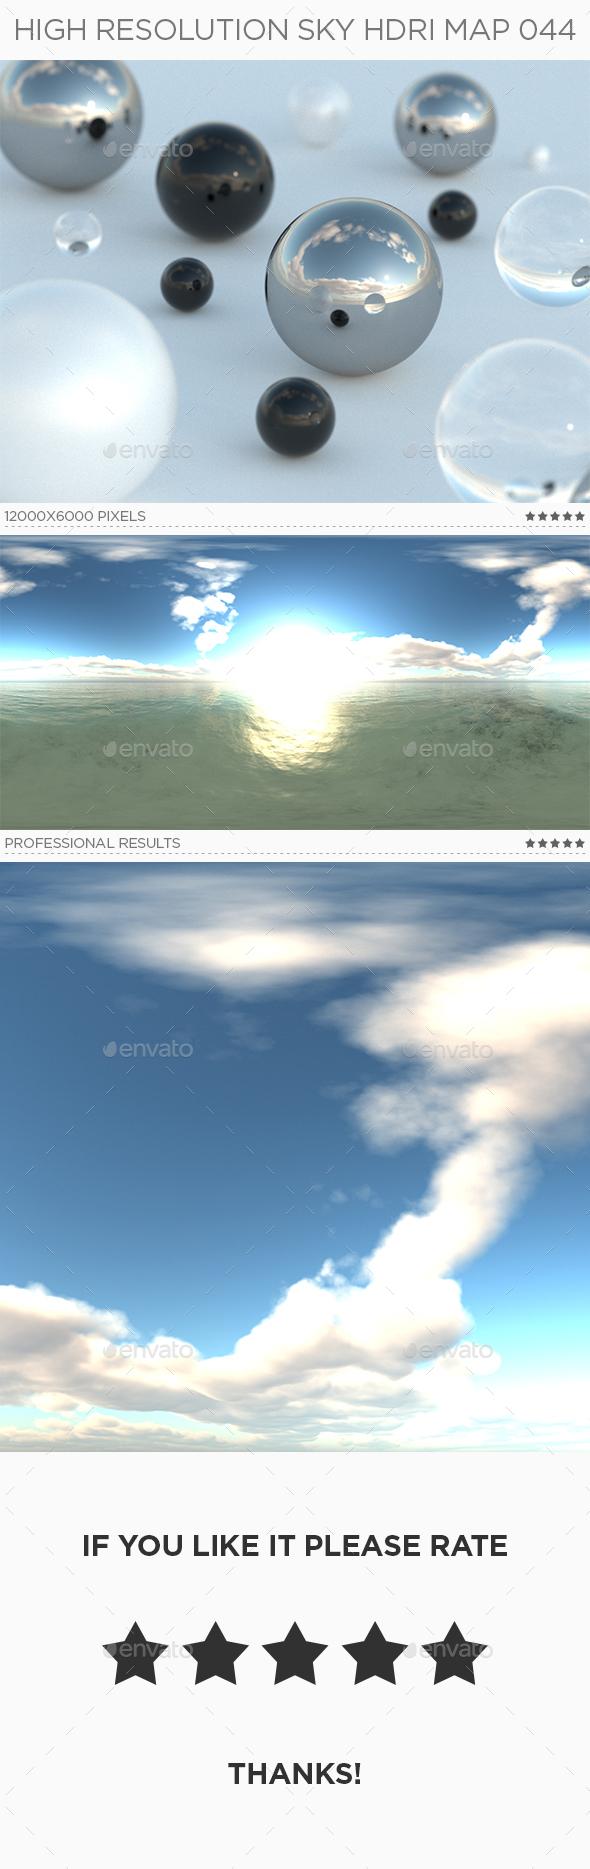 High Resolution Sky HDRi Map 044